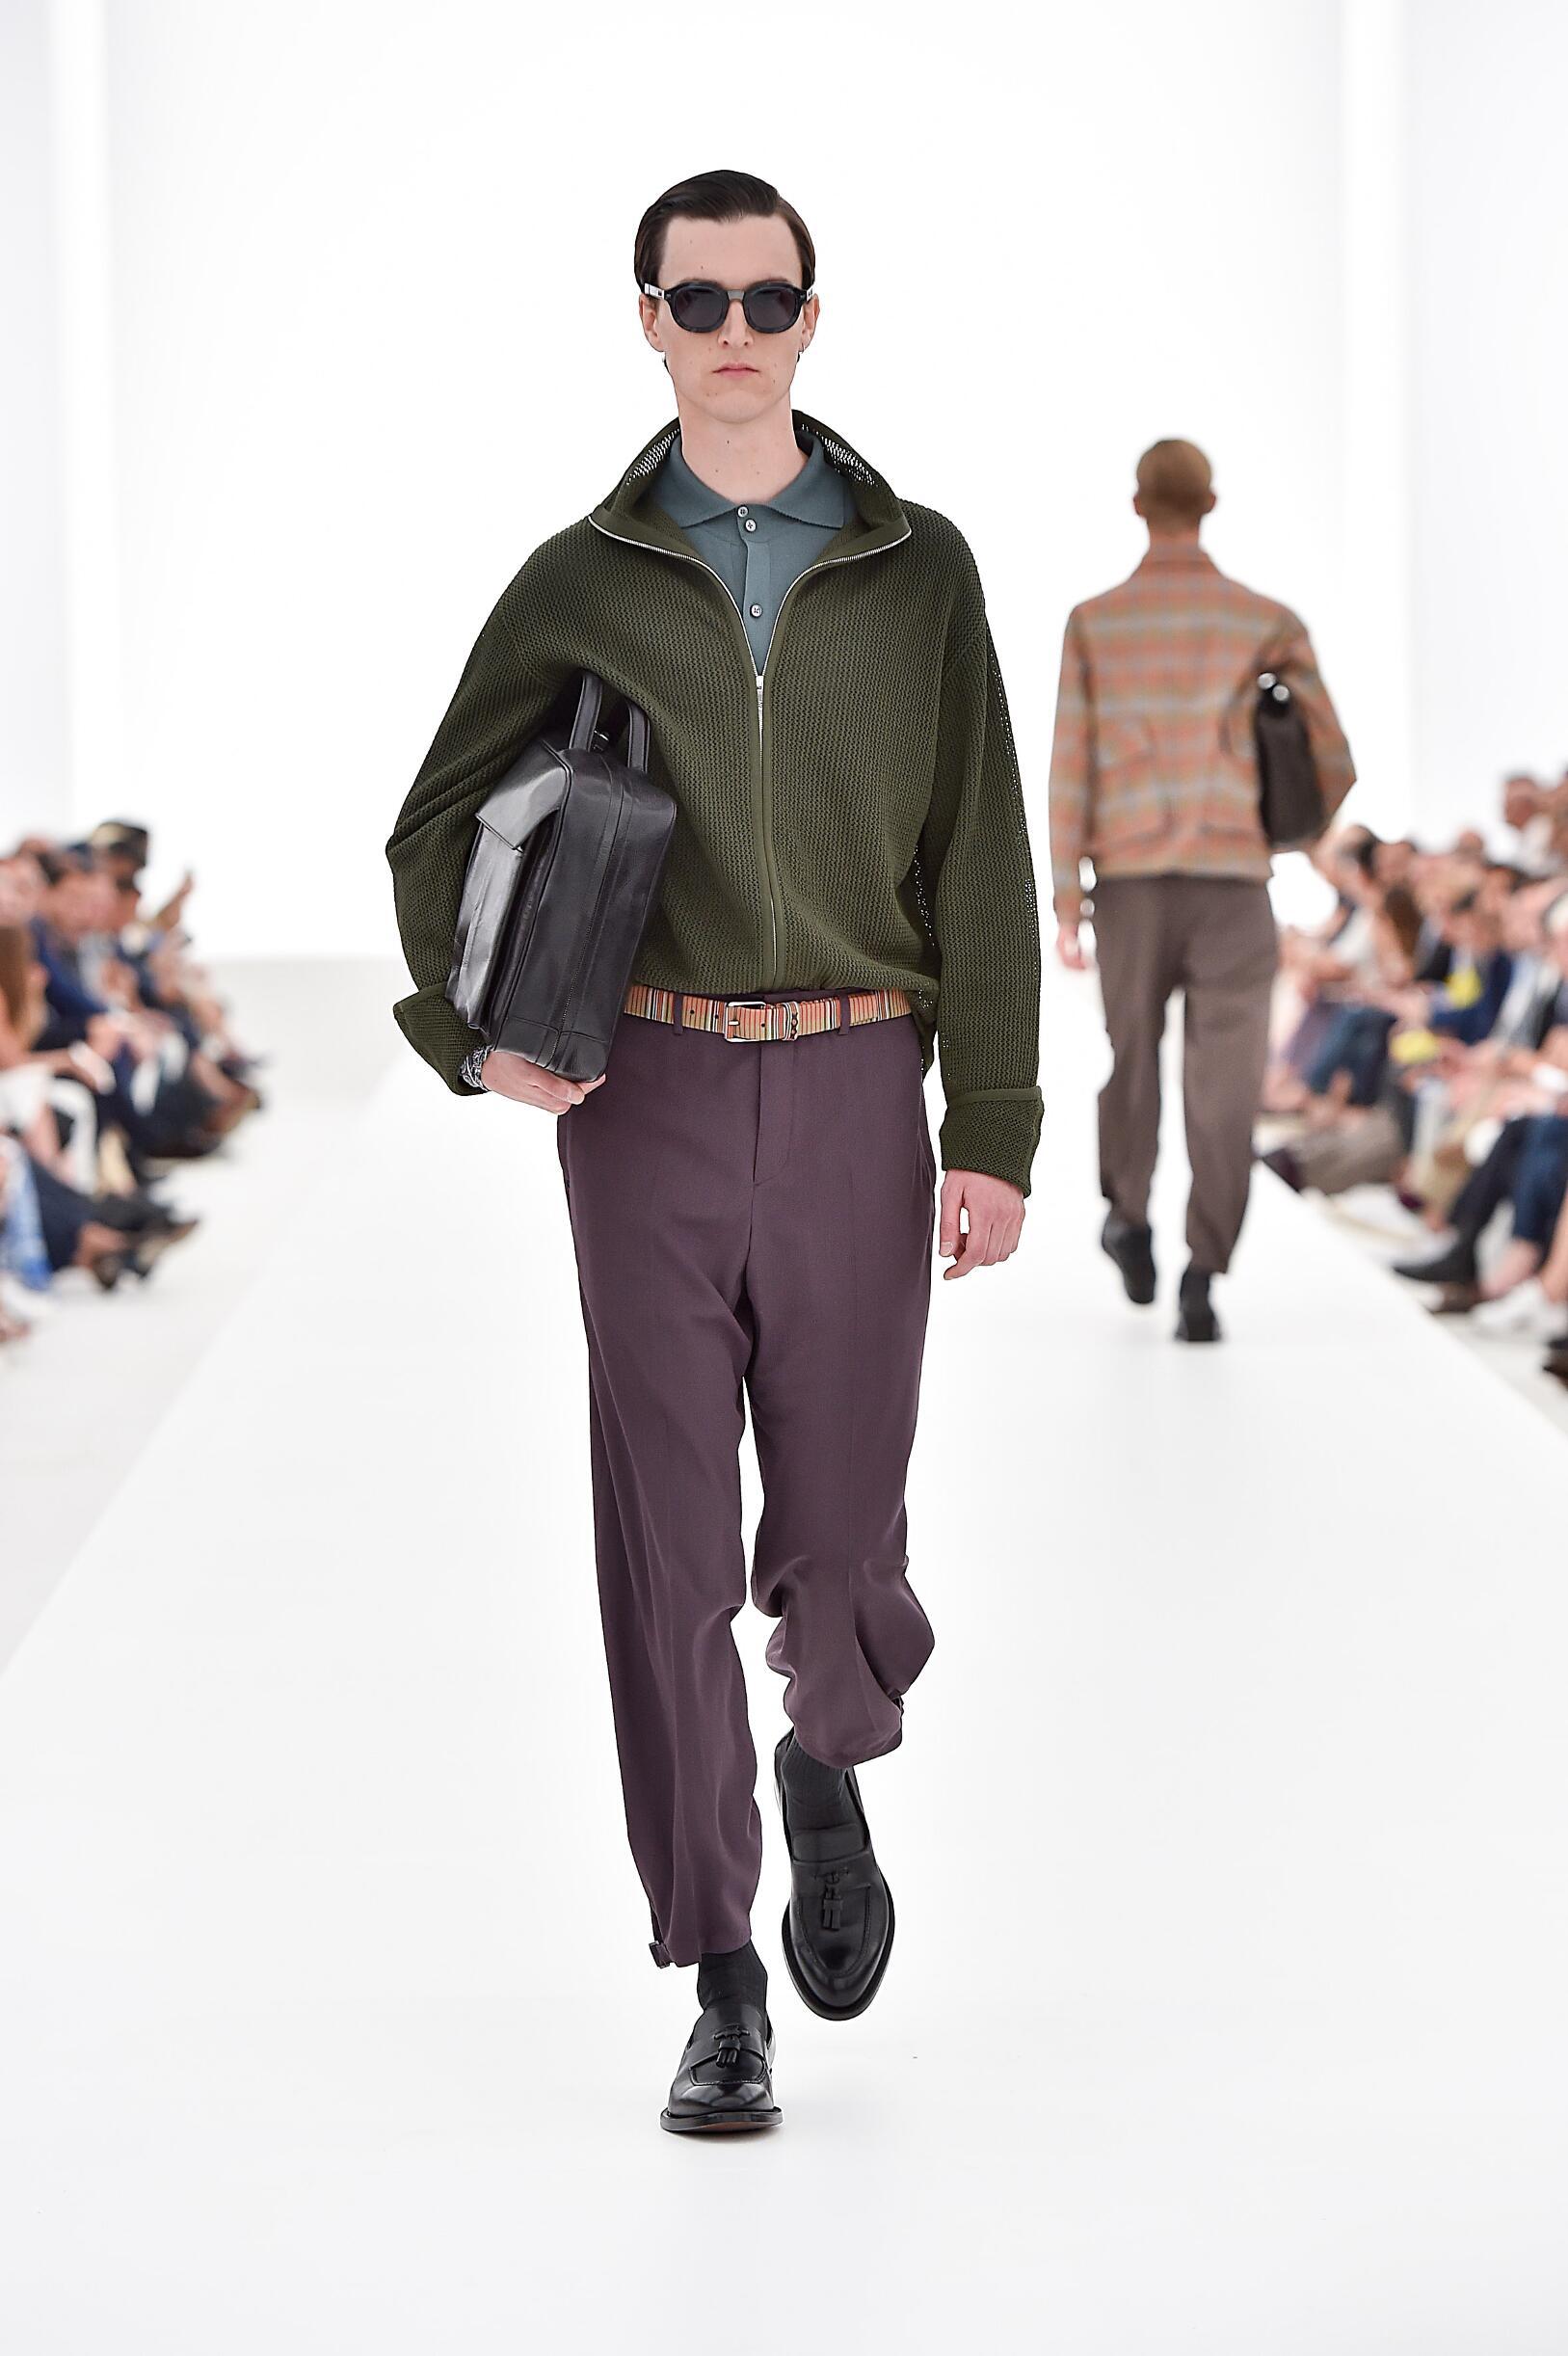 Summer Fashion Trends 2016 Ermenegildo Zegna Couture Collection